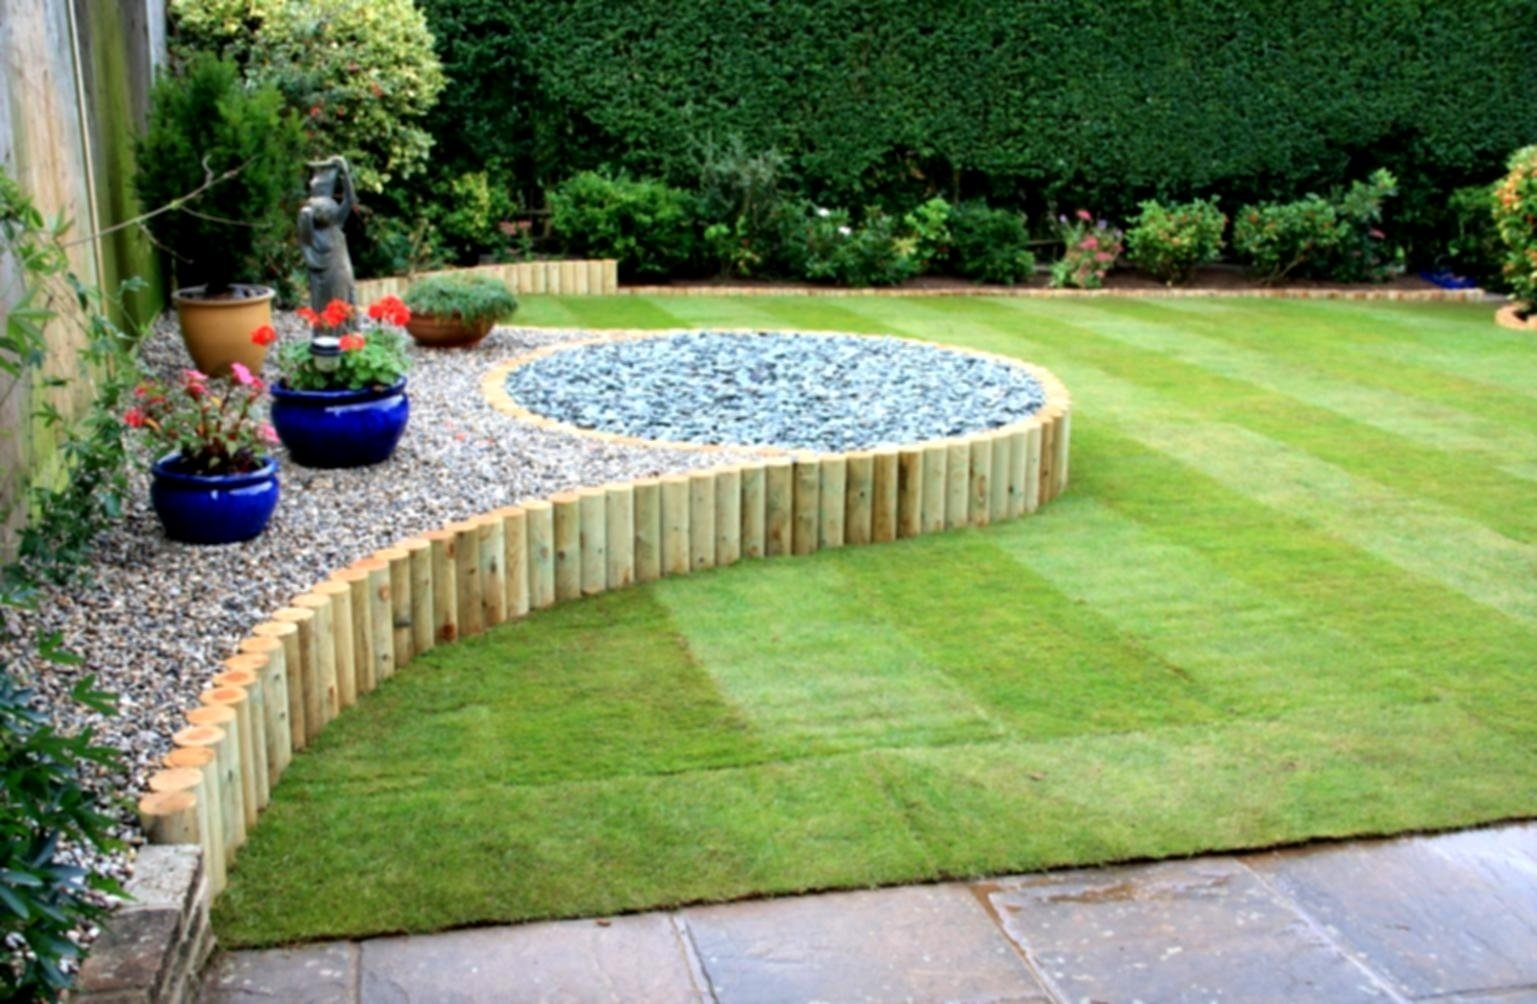 10 Pretty Cheap And Easy Backyard Ideas garden landscaping ideas best about backyard on amazing cheap 2020